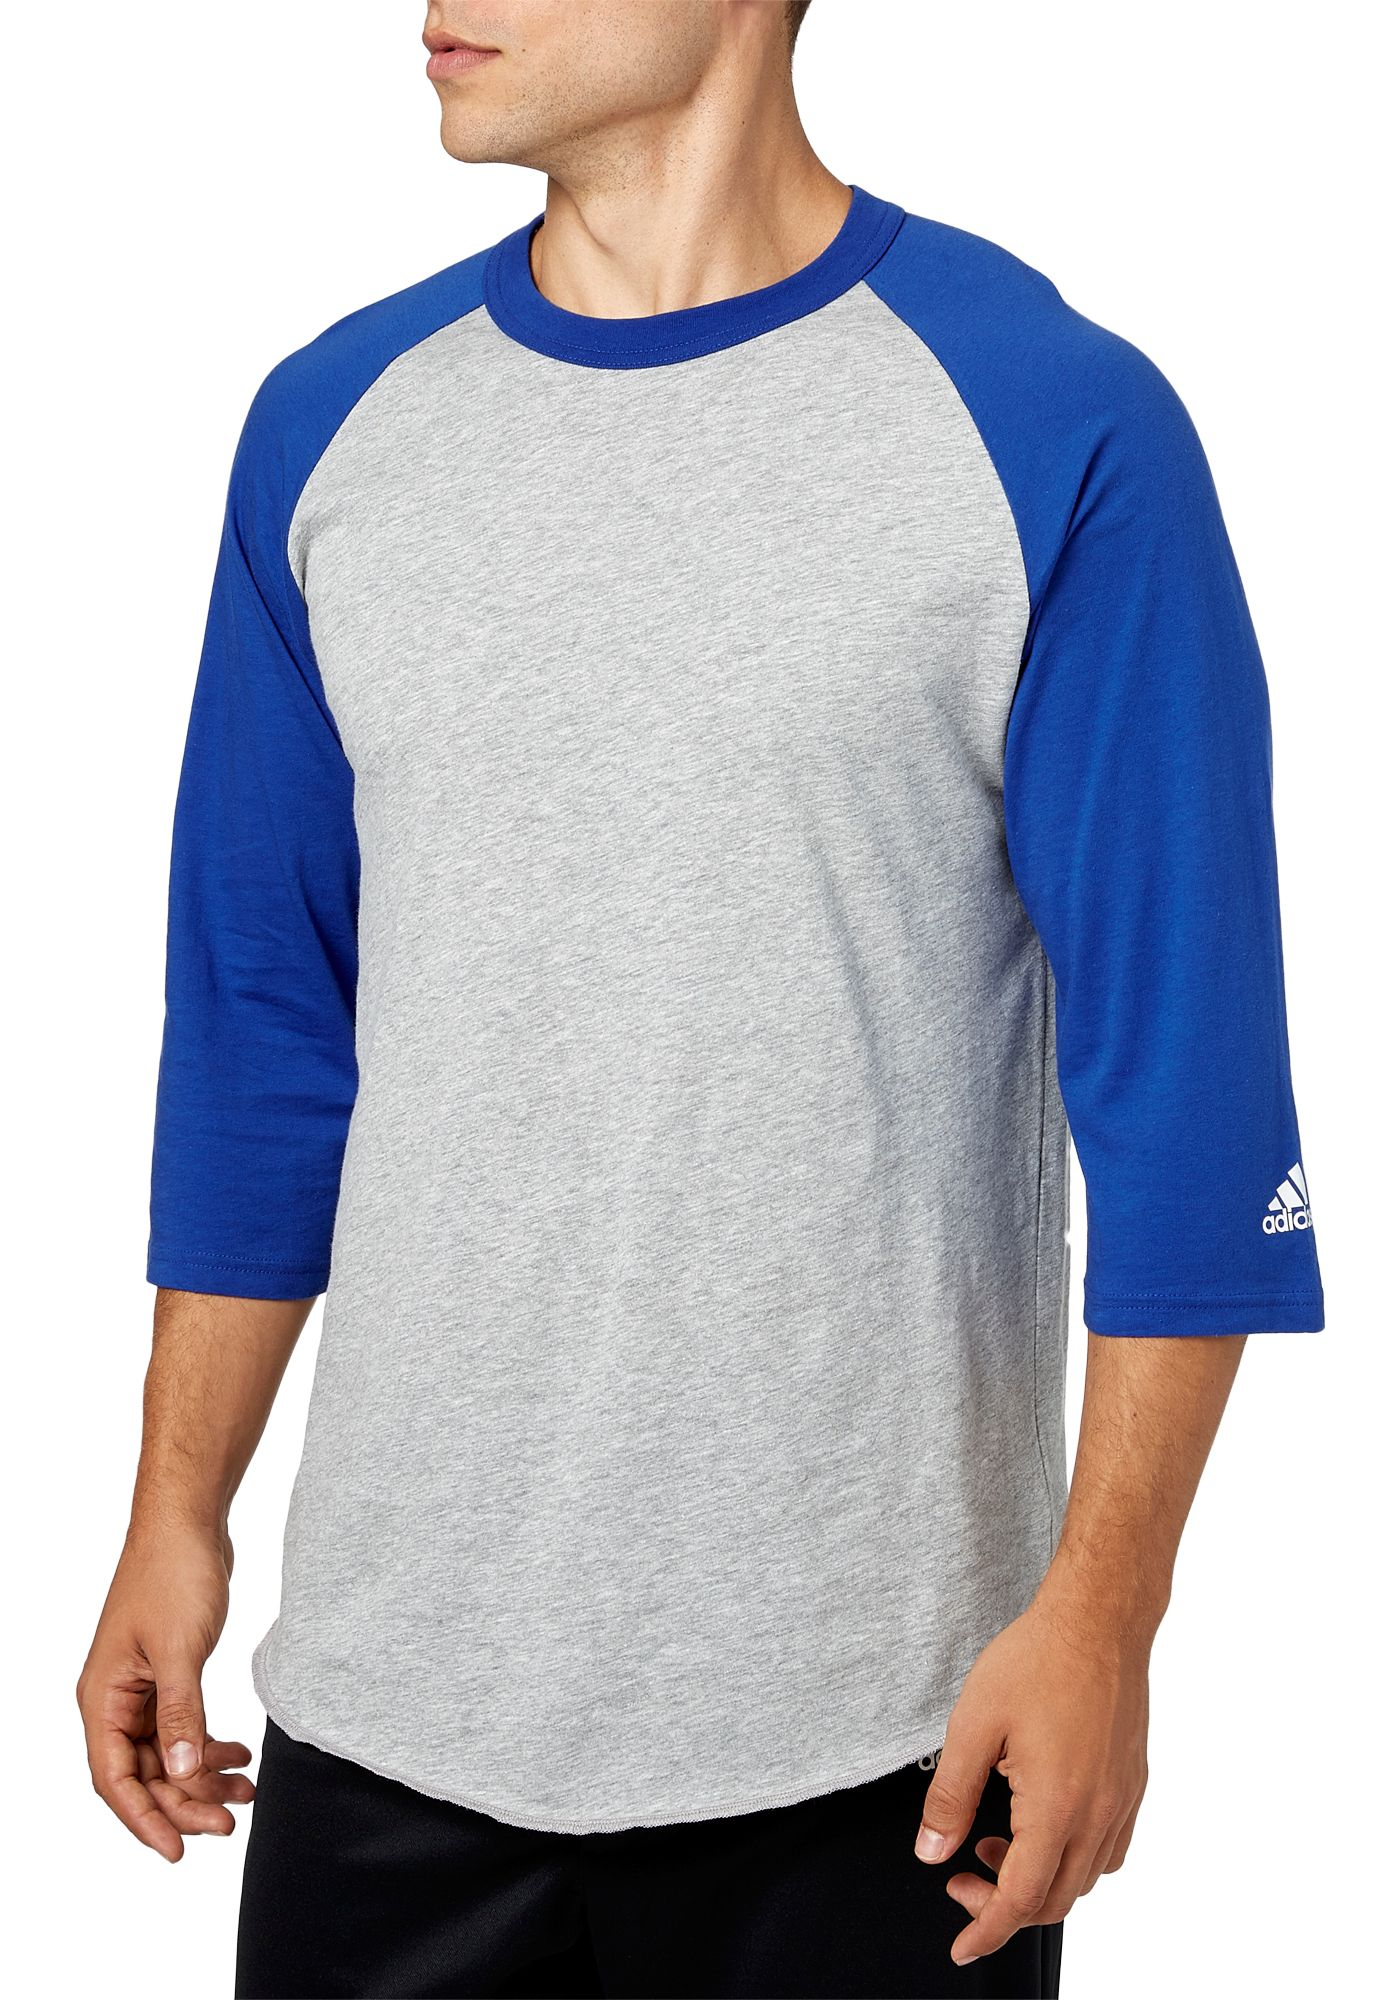 adidas Men's Triple Stripe ¾ Sleeve Heather Baseball Shirt